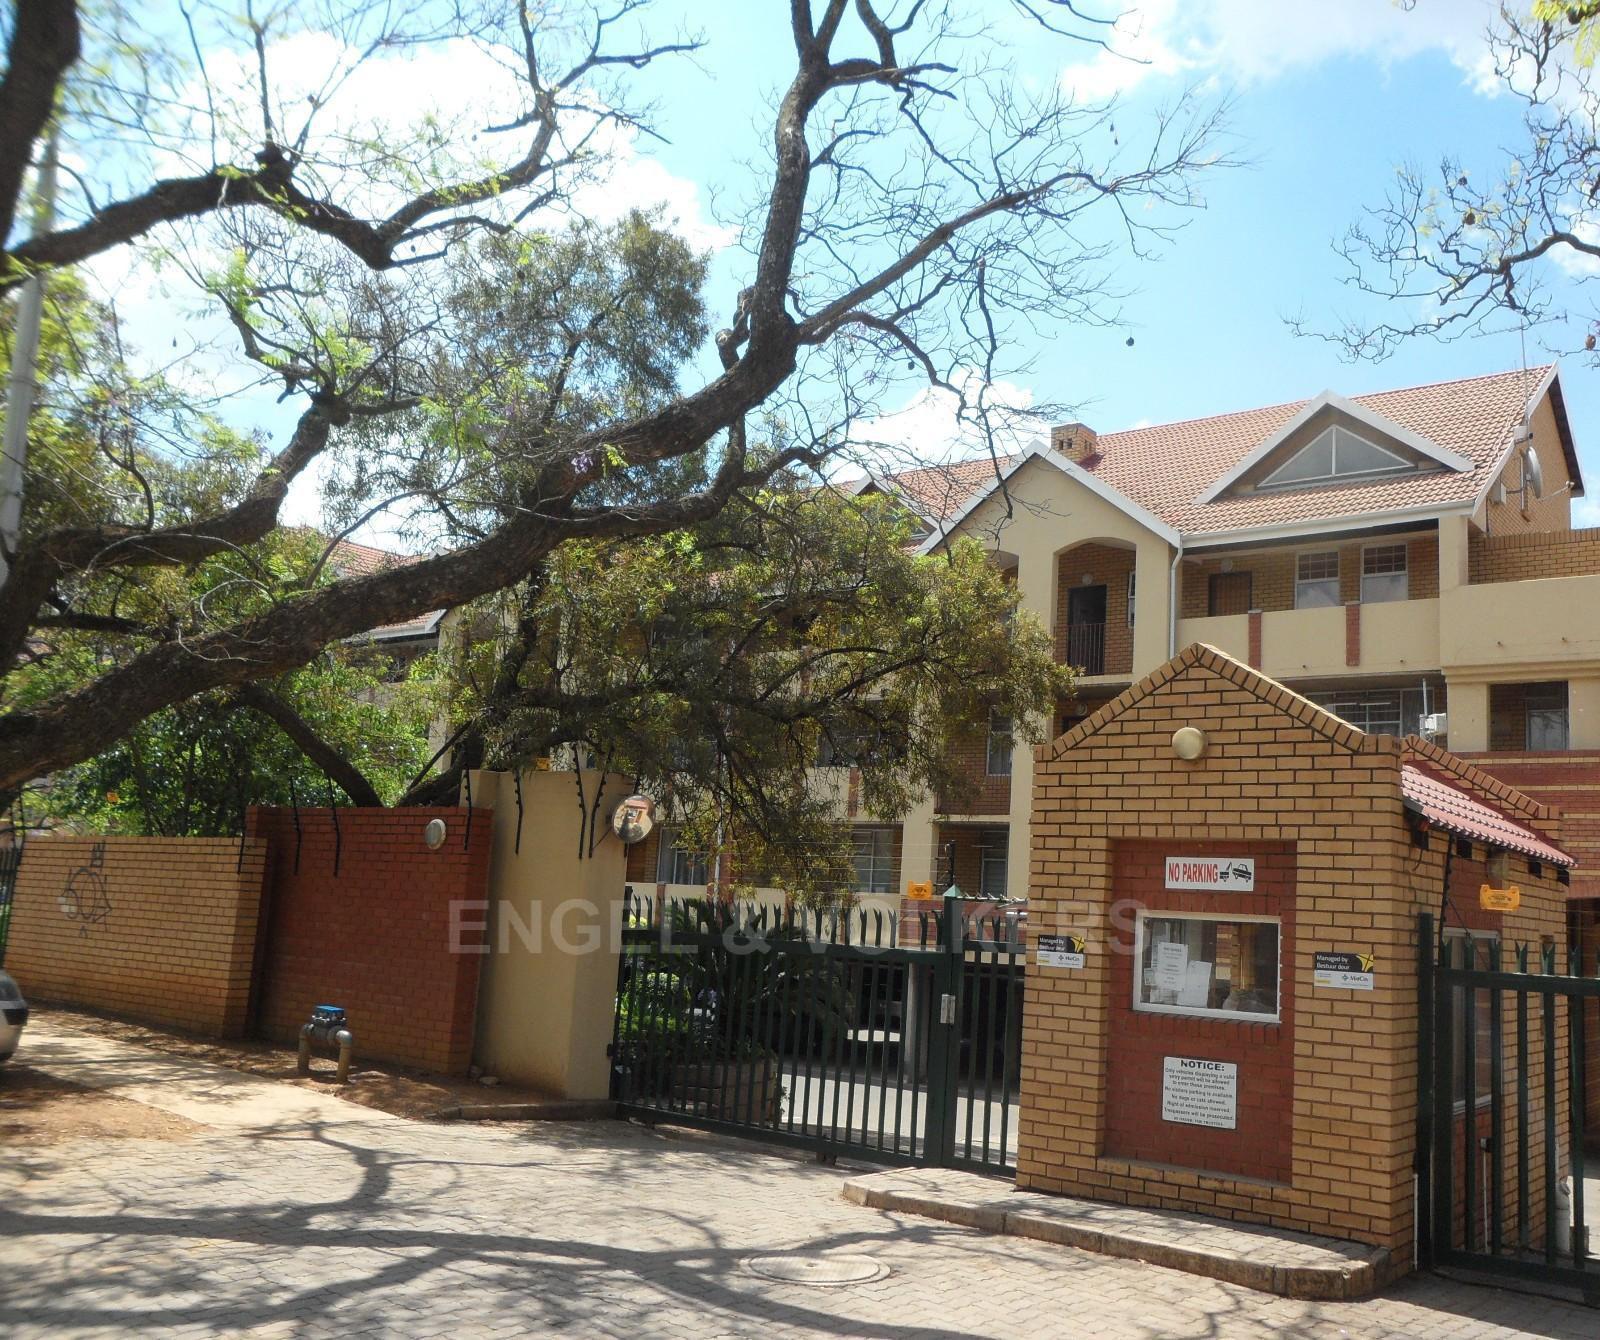 Pretoria, Hatfield Property  | Houses For Sale Hatfield, HATFIELD, Apartment 3 bedrooms property for sale Price:1,295,000